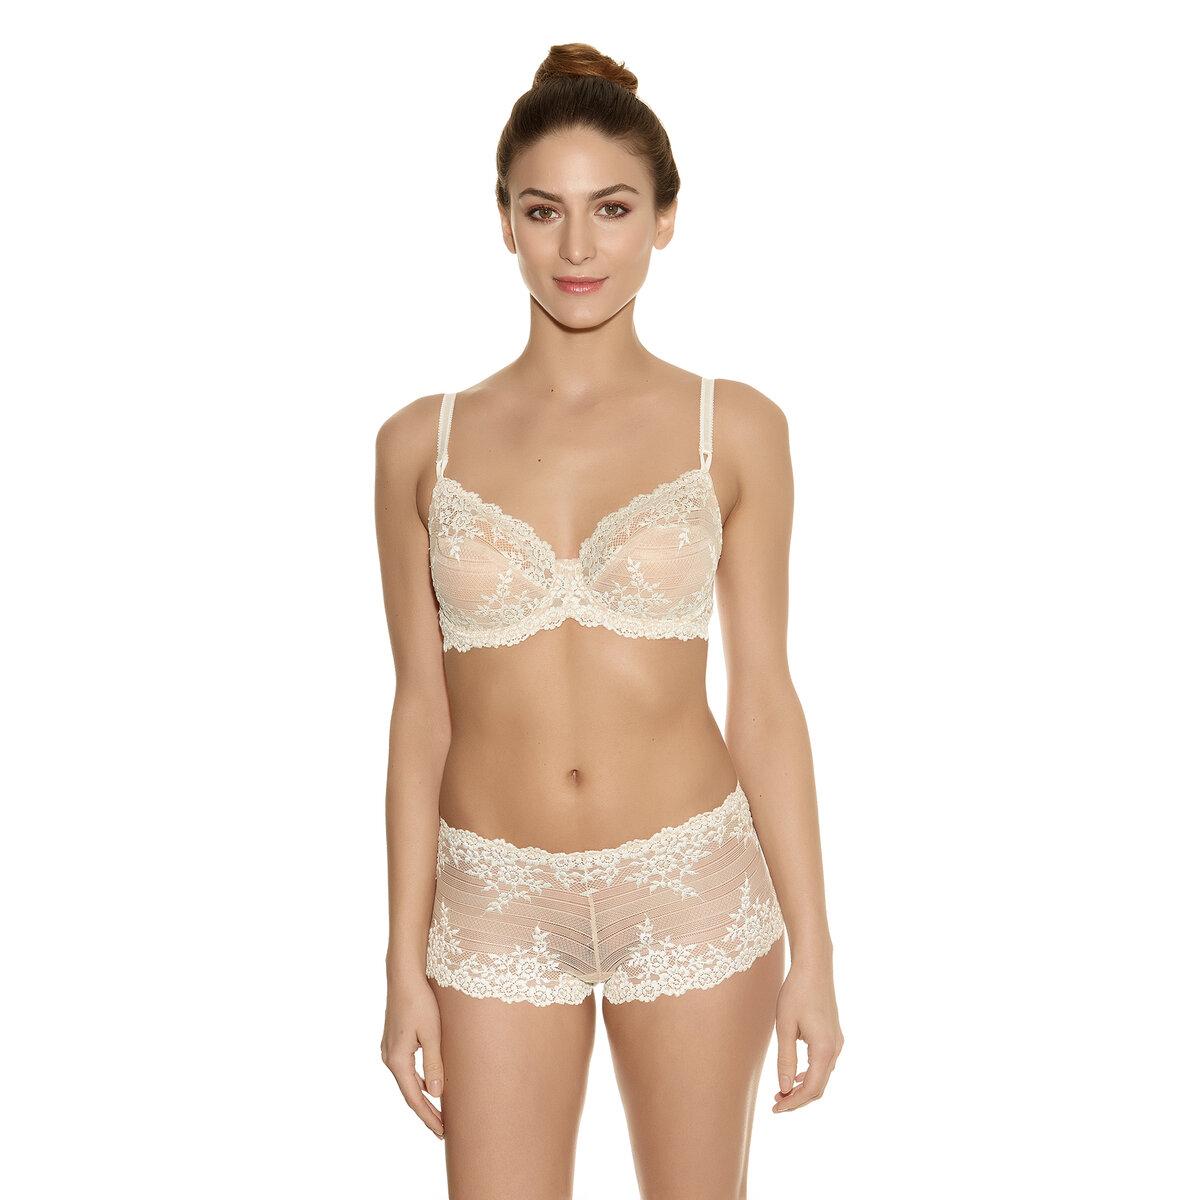 Wacoal silver embrace lace bra bikini